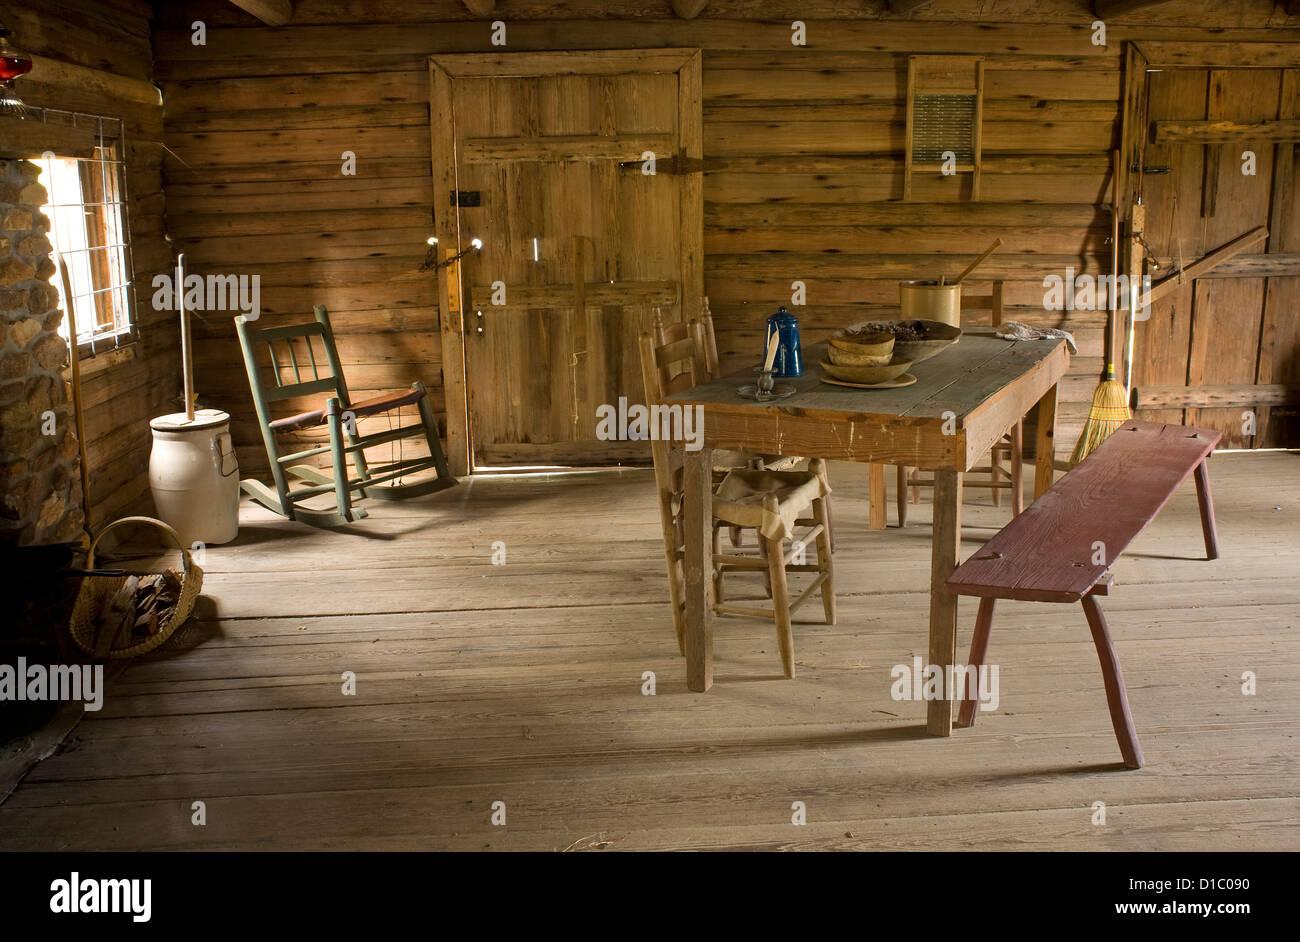 Log Cabin Interior Stockfotos & Log Cabin Interior Bilder - Alamy